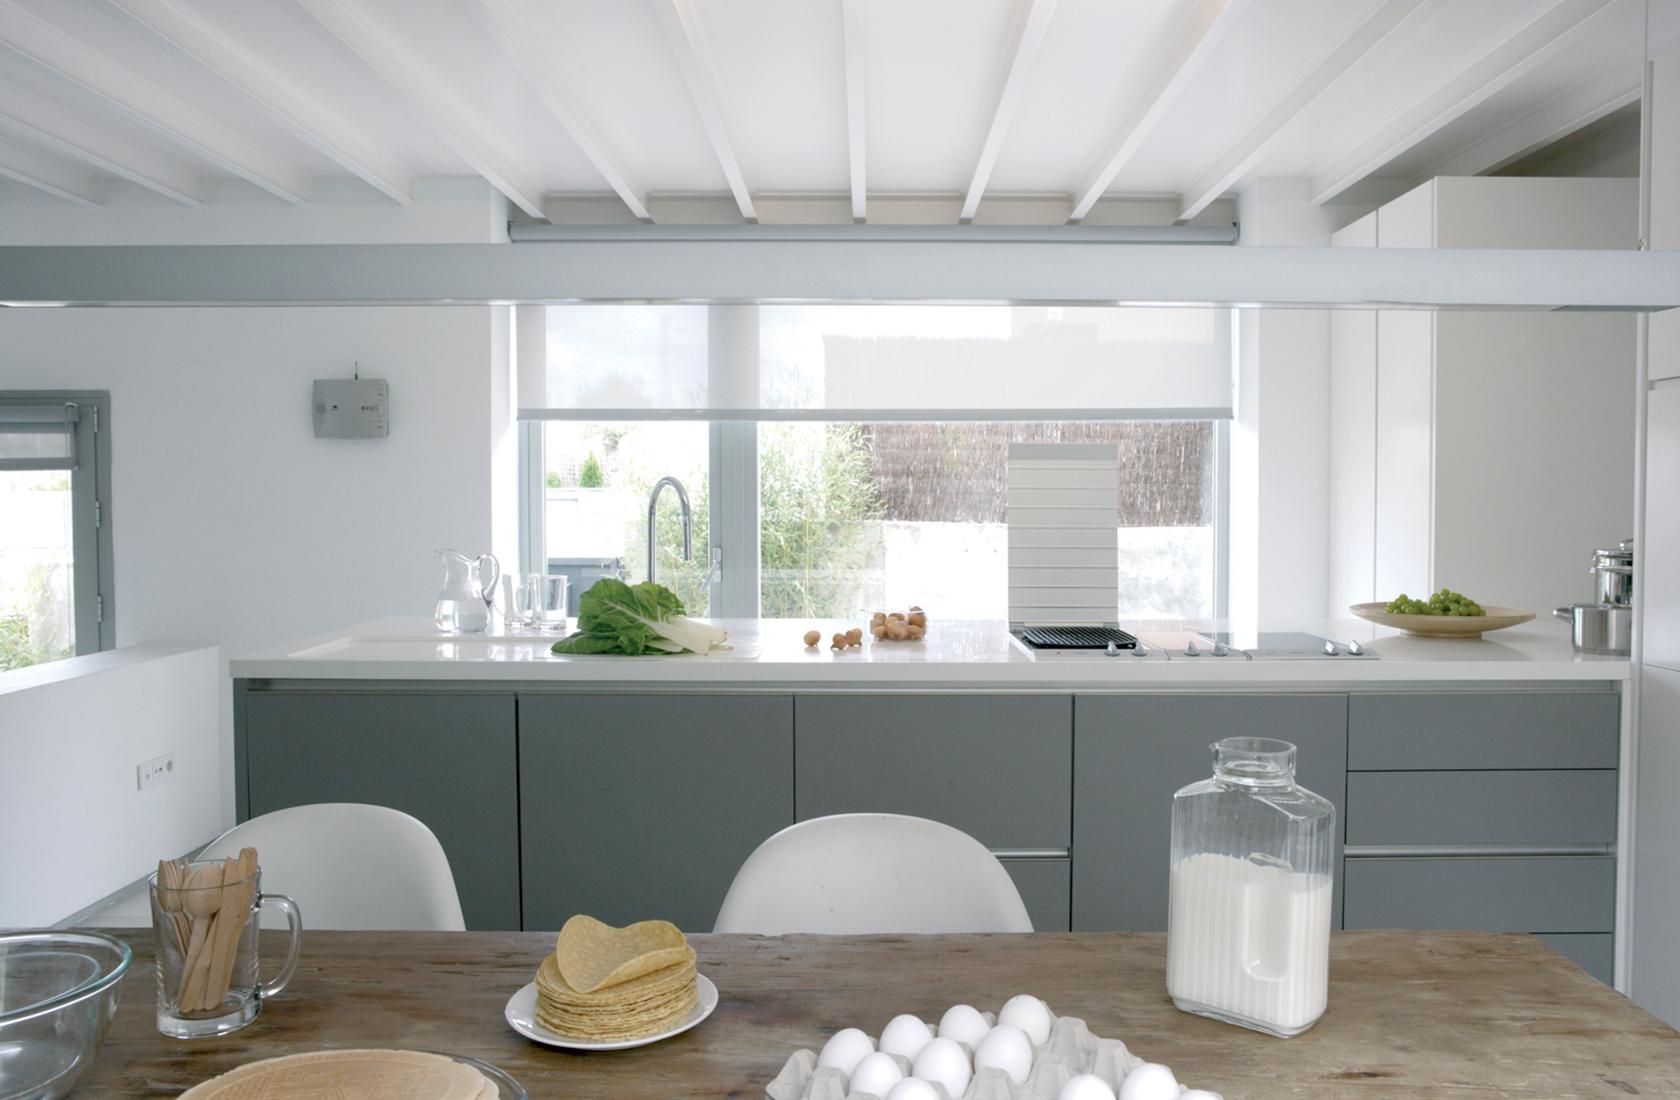 Casa c 29 cocina 1